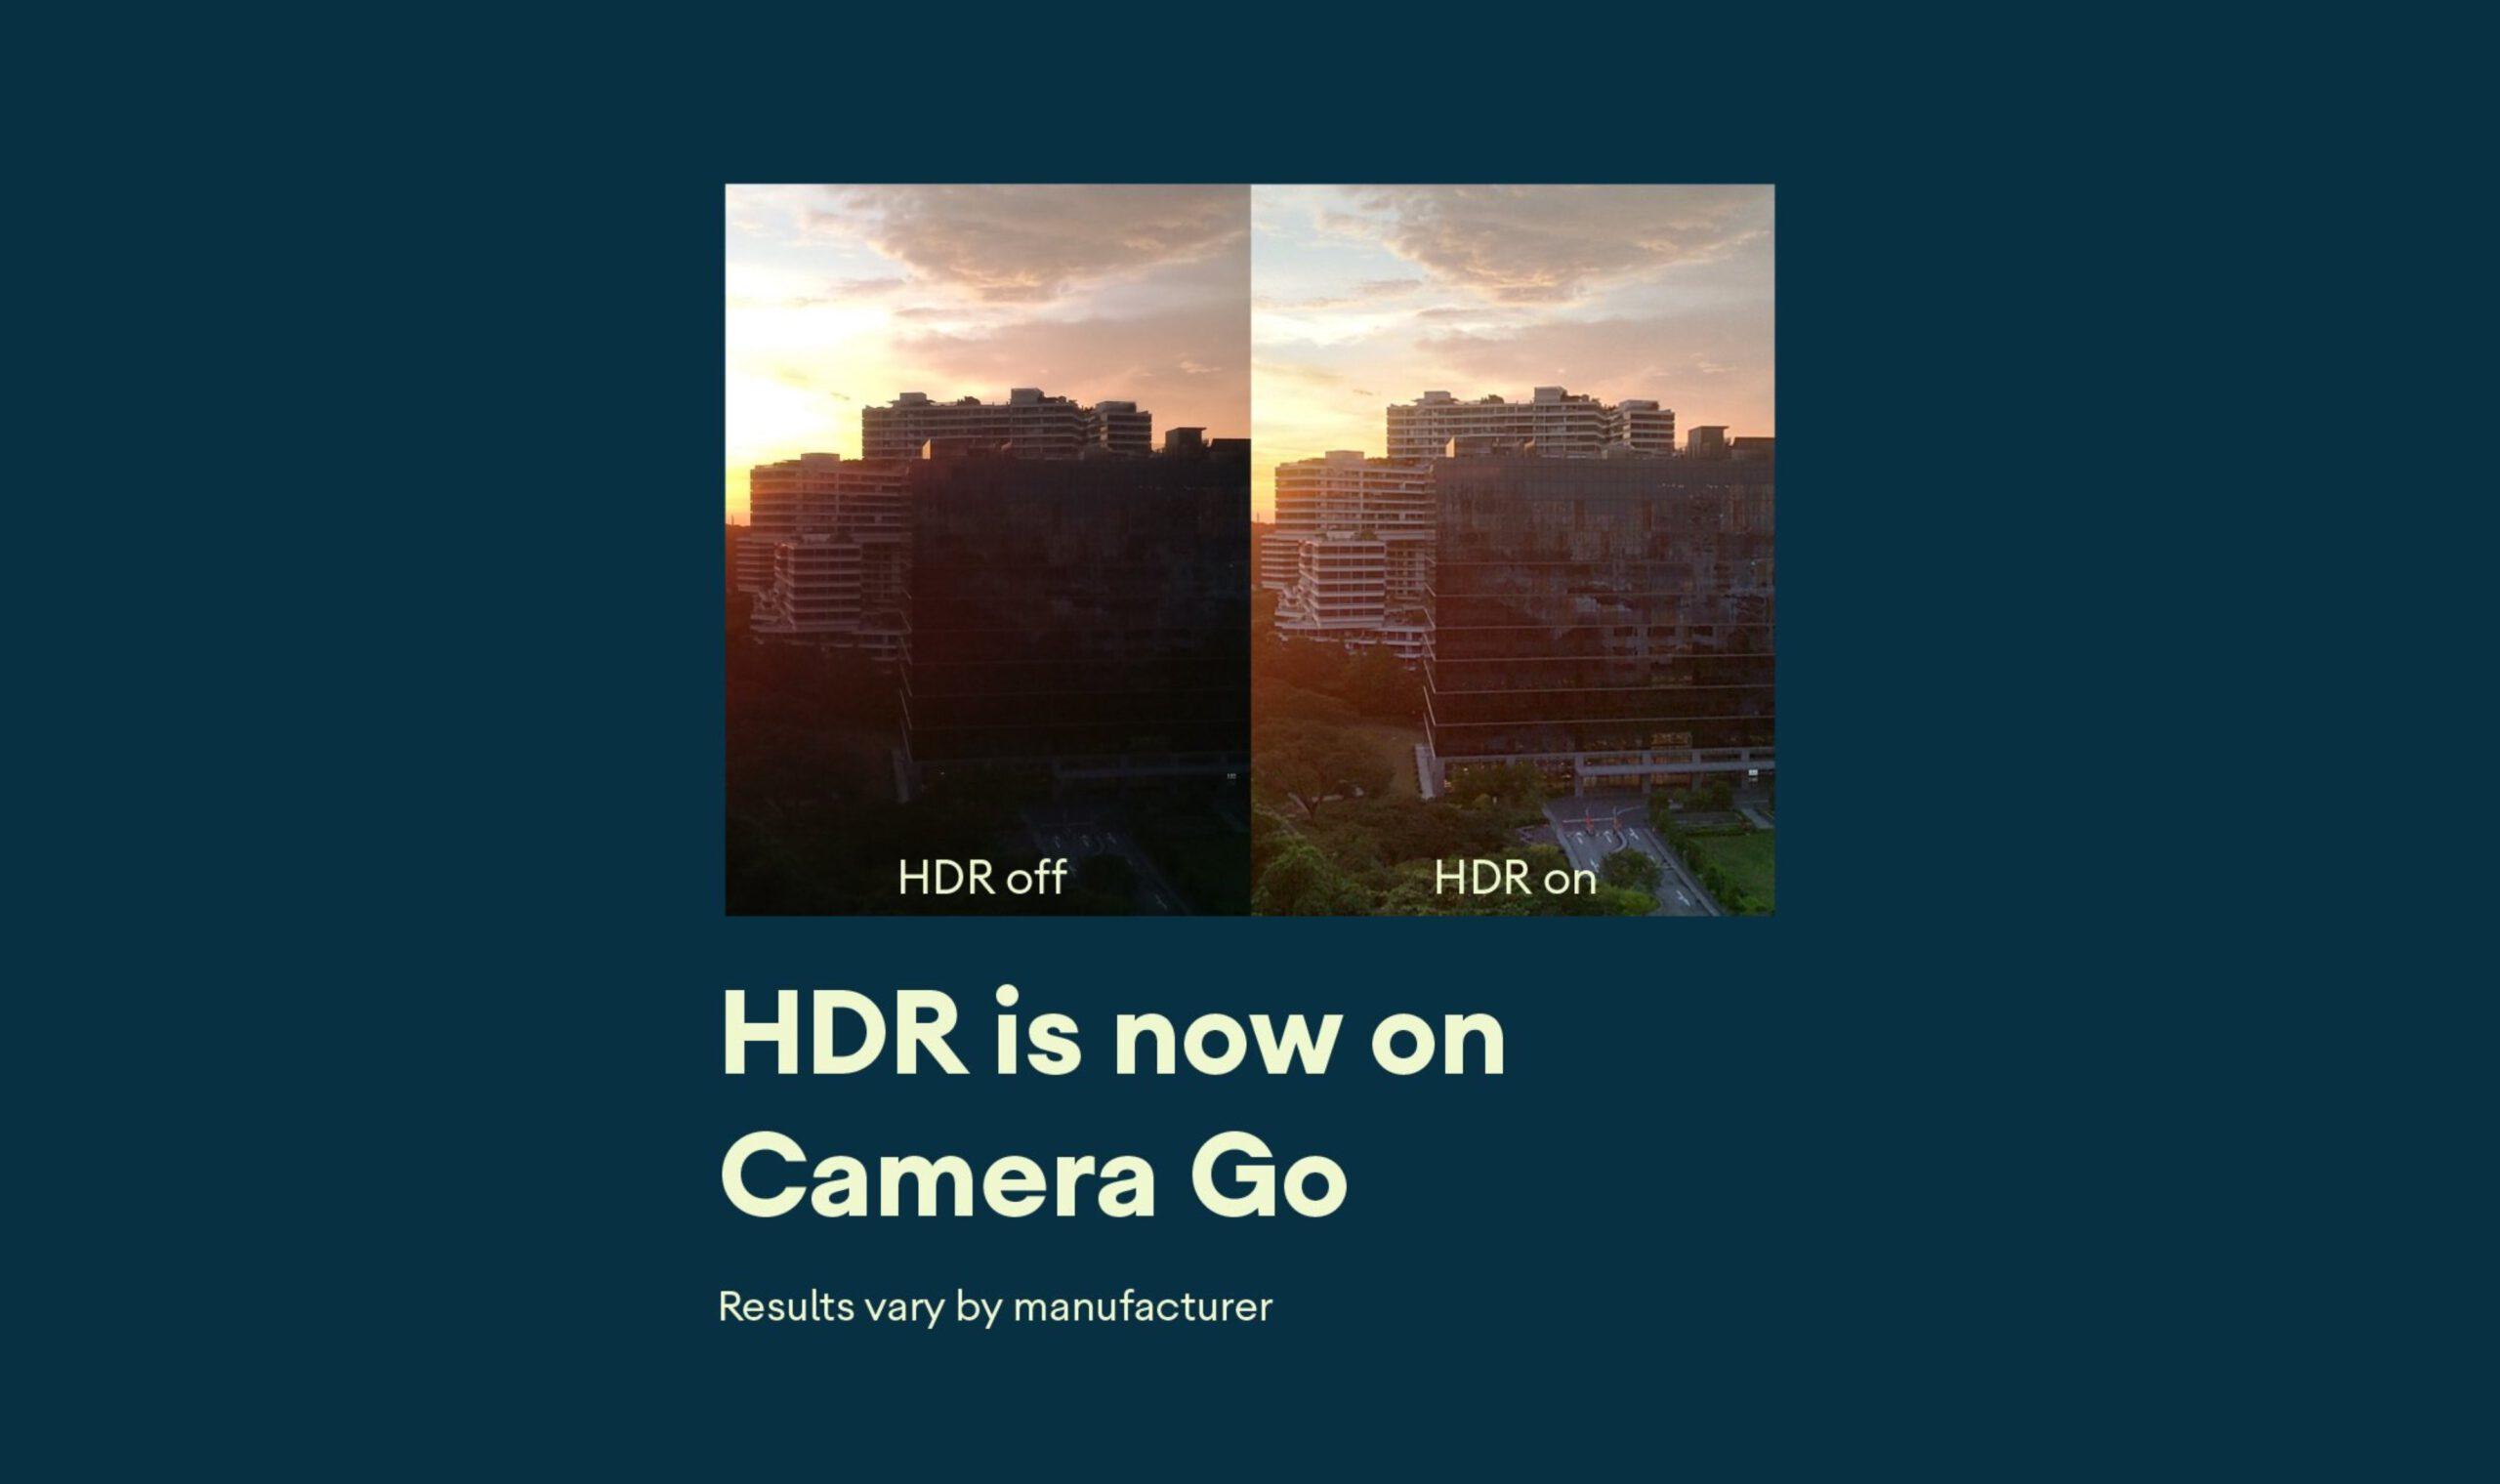 Google Camera Go HDR